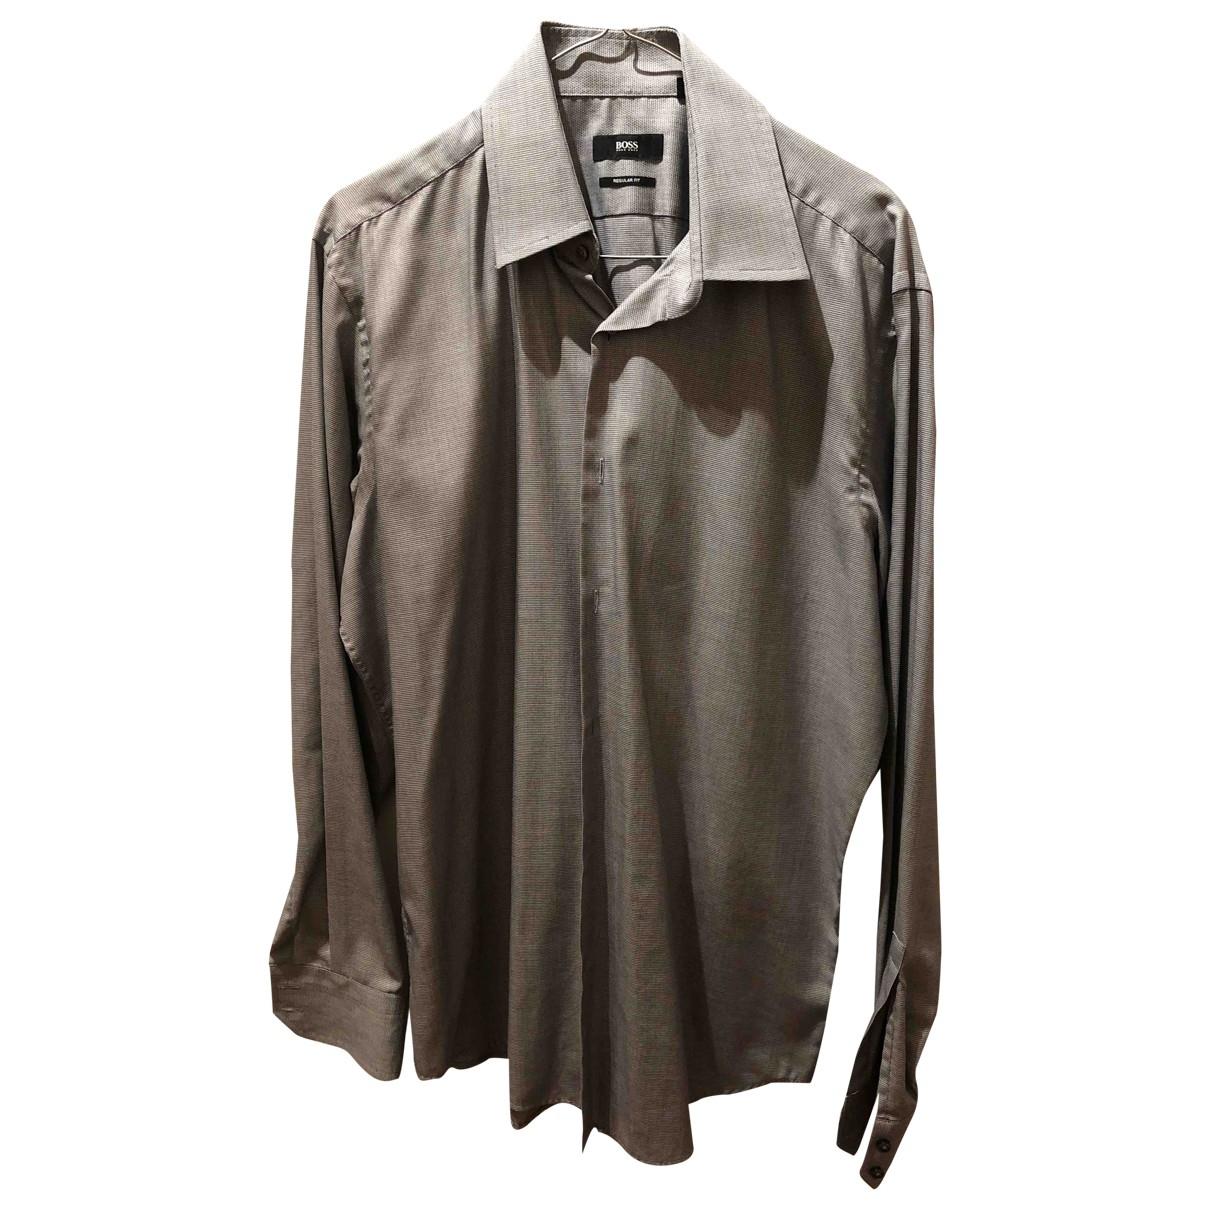 Hugo Boss \N Grey Cotton Shirts for Men 41 EU (tour de cou / collar)